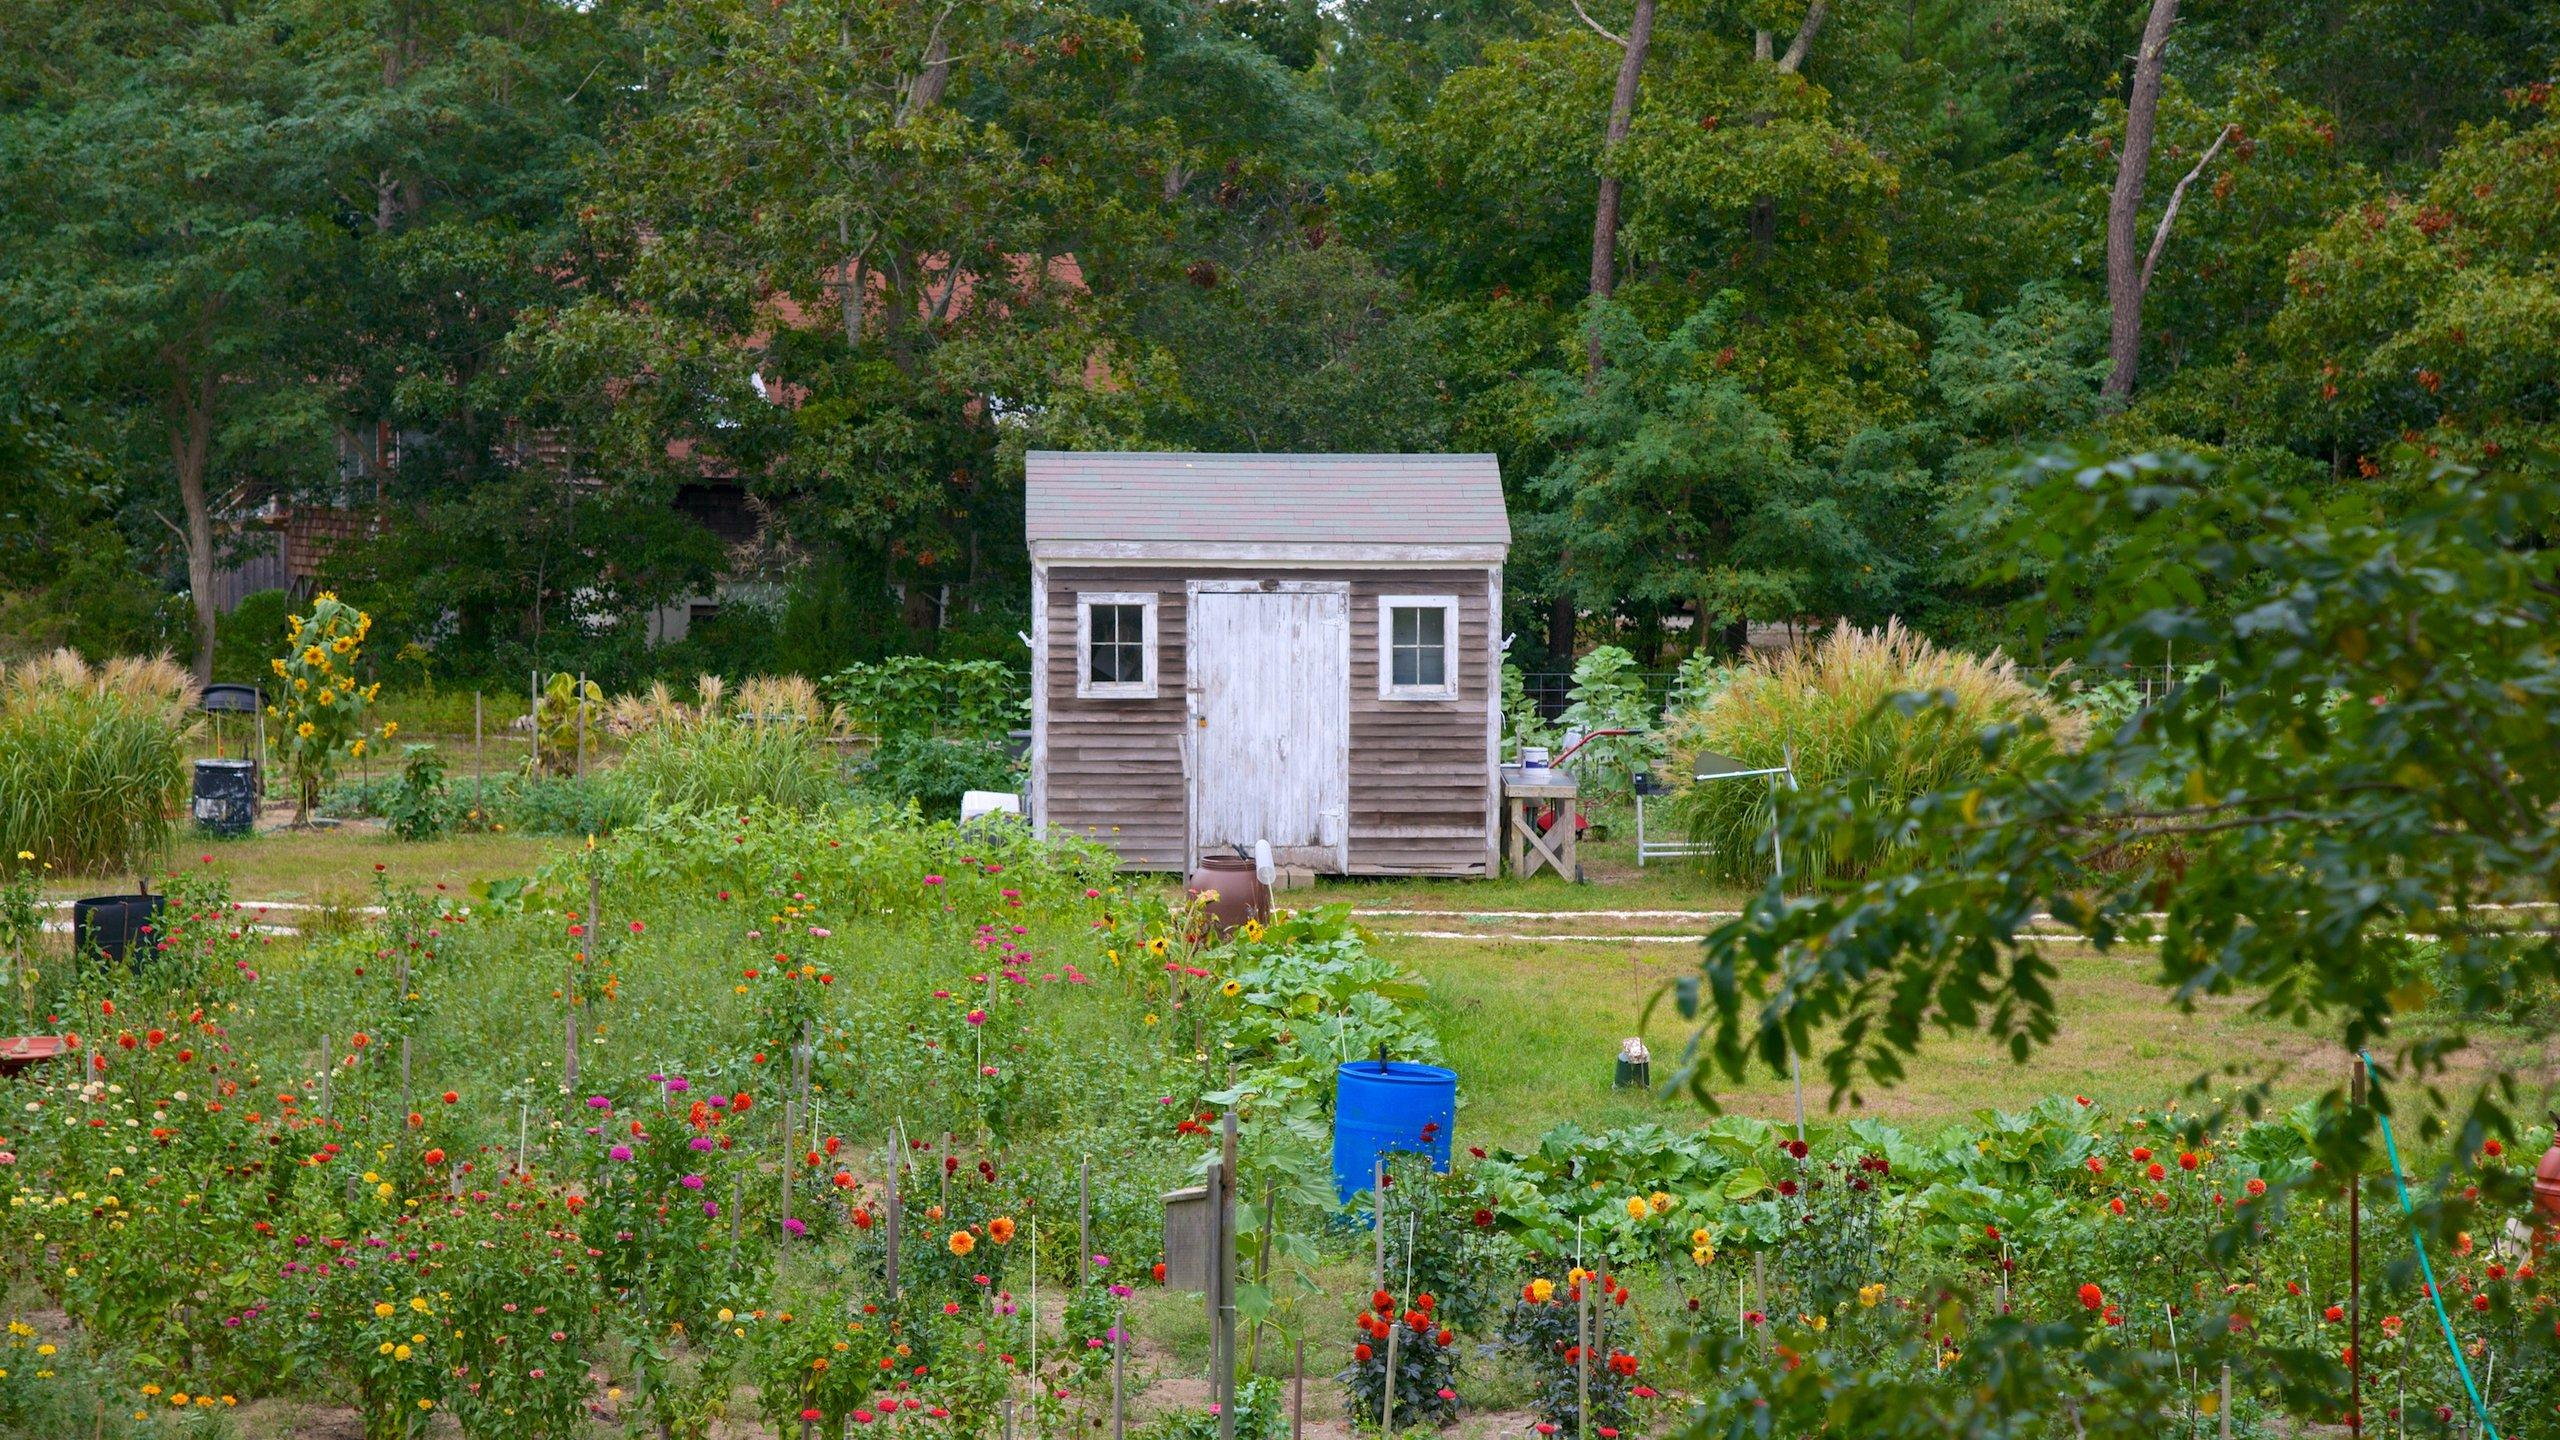 Truro, Massachusetts, United States of America